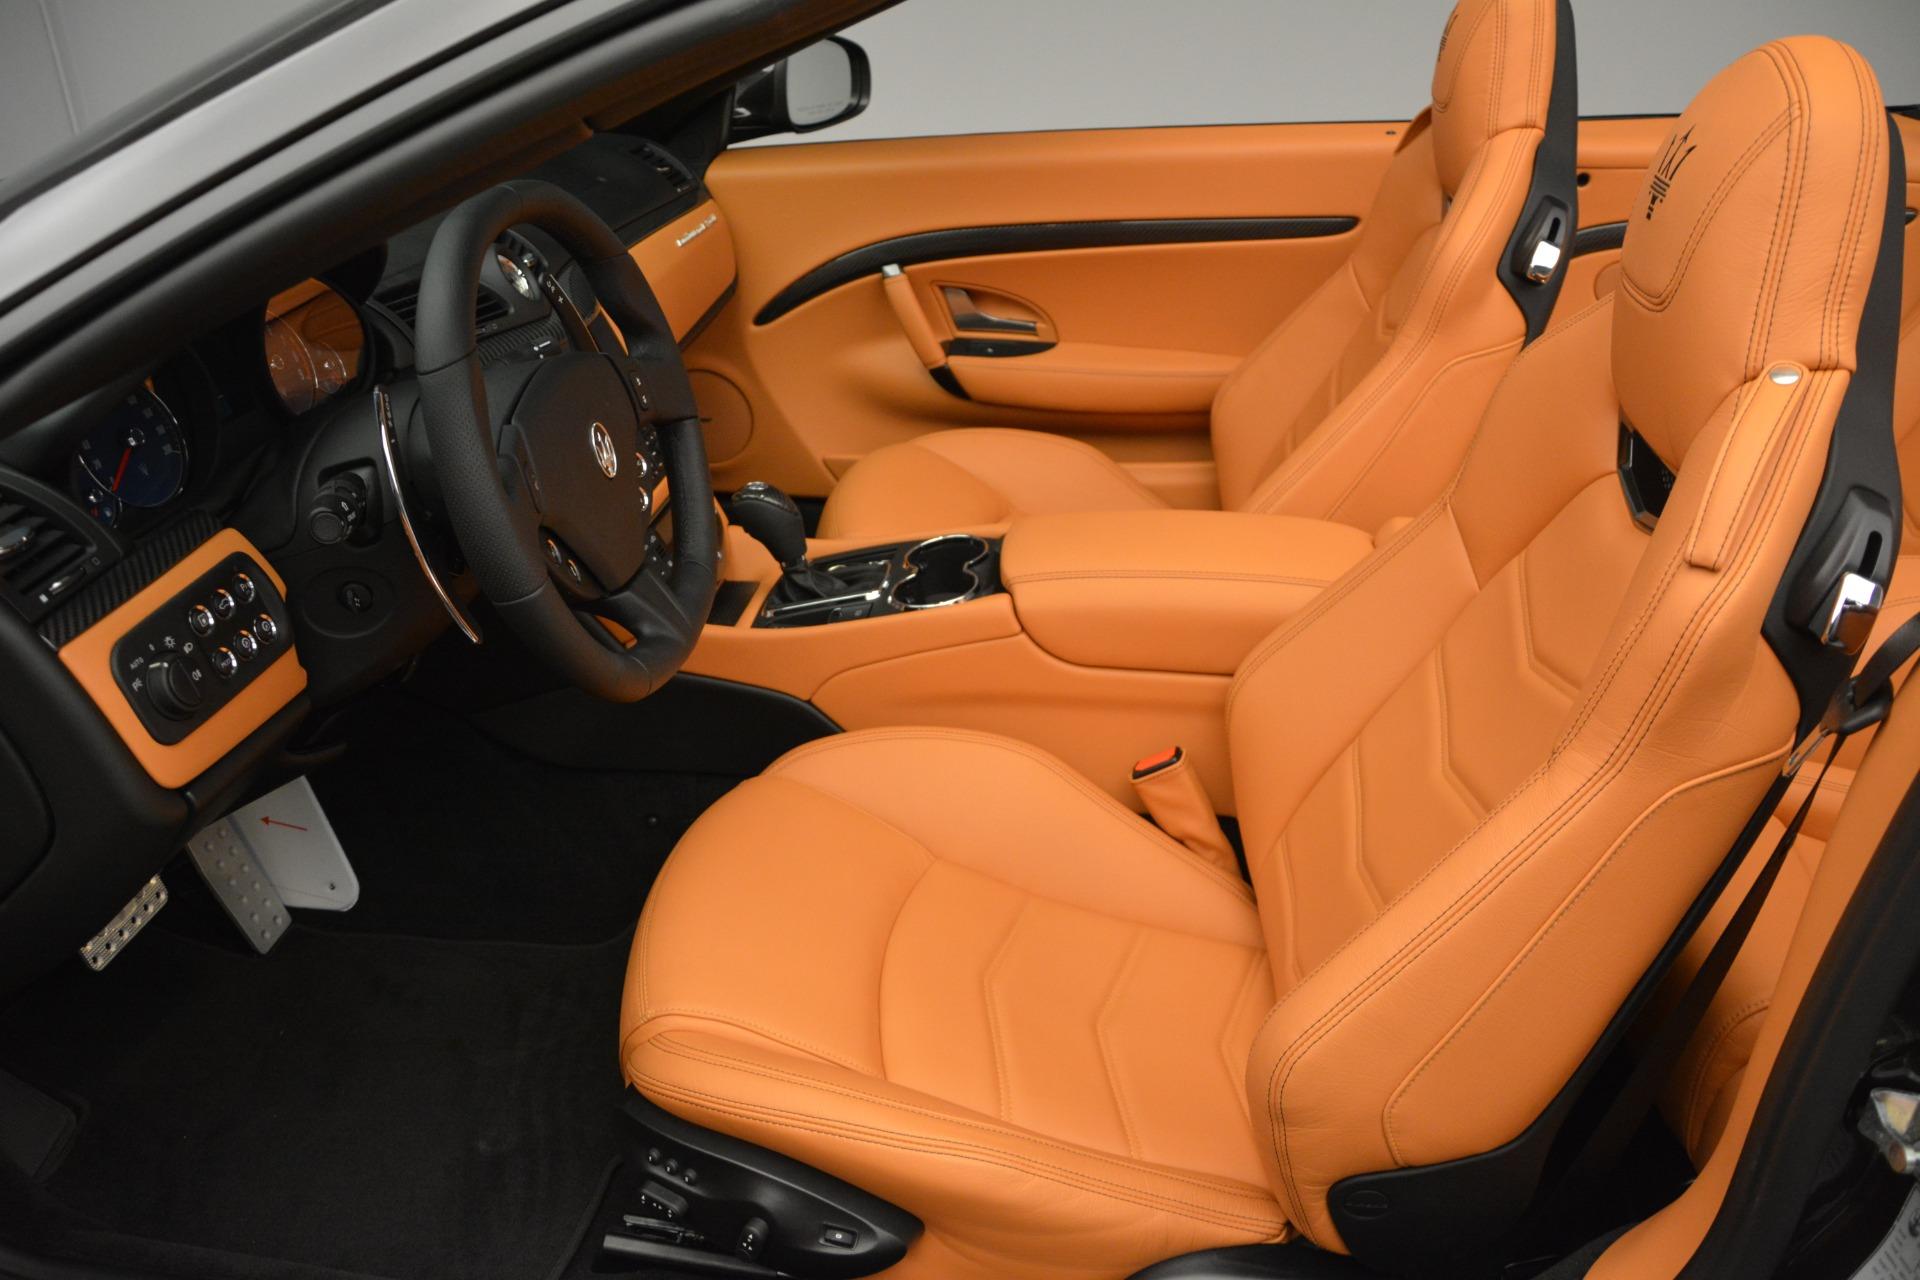 Used 2015 Maserati GranTurismo Sport Convertible For Sale In Westport, CT 2129_p20